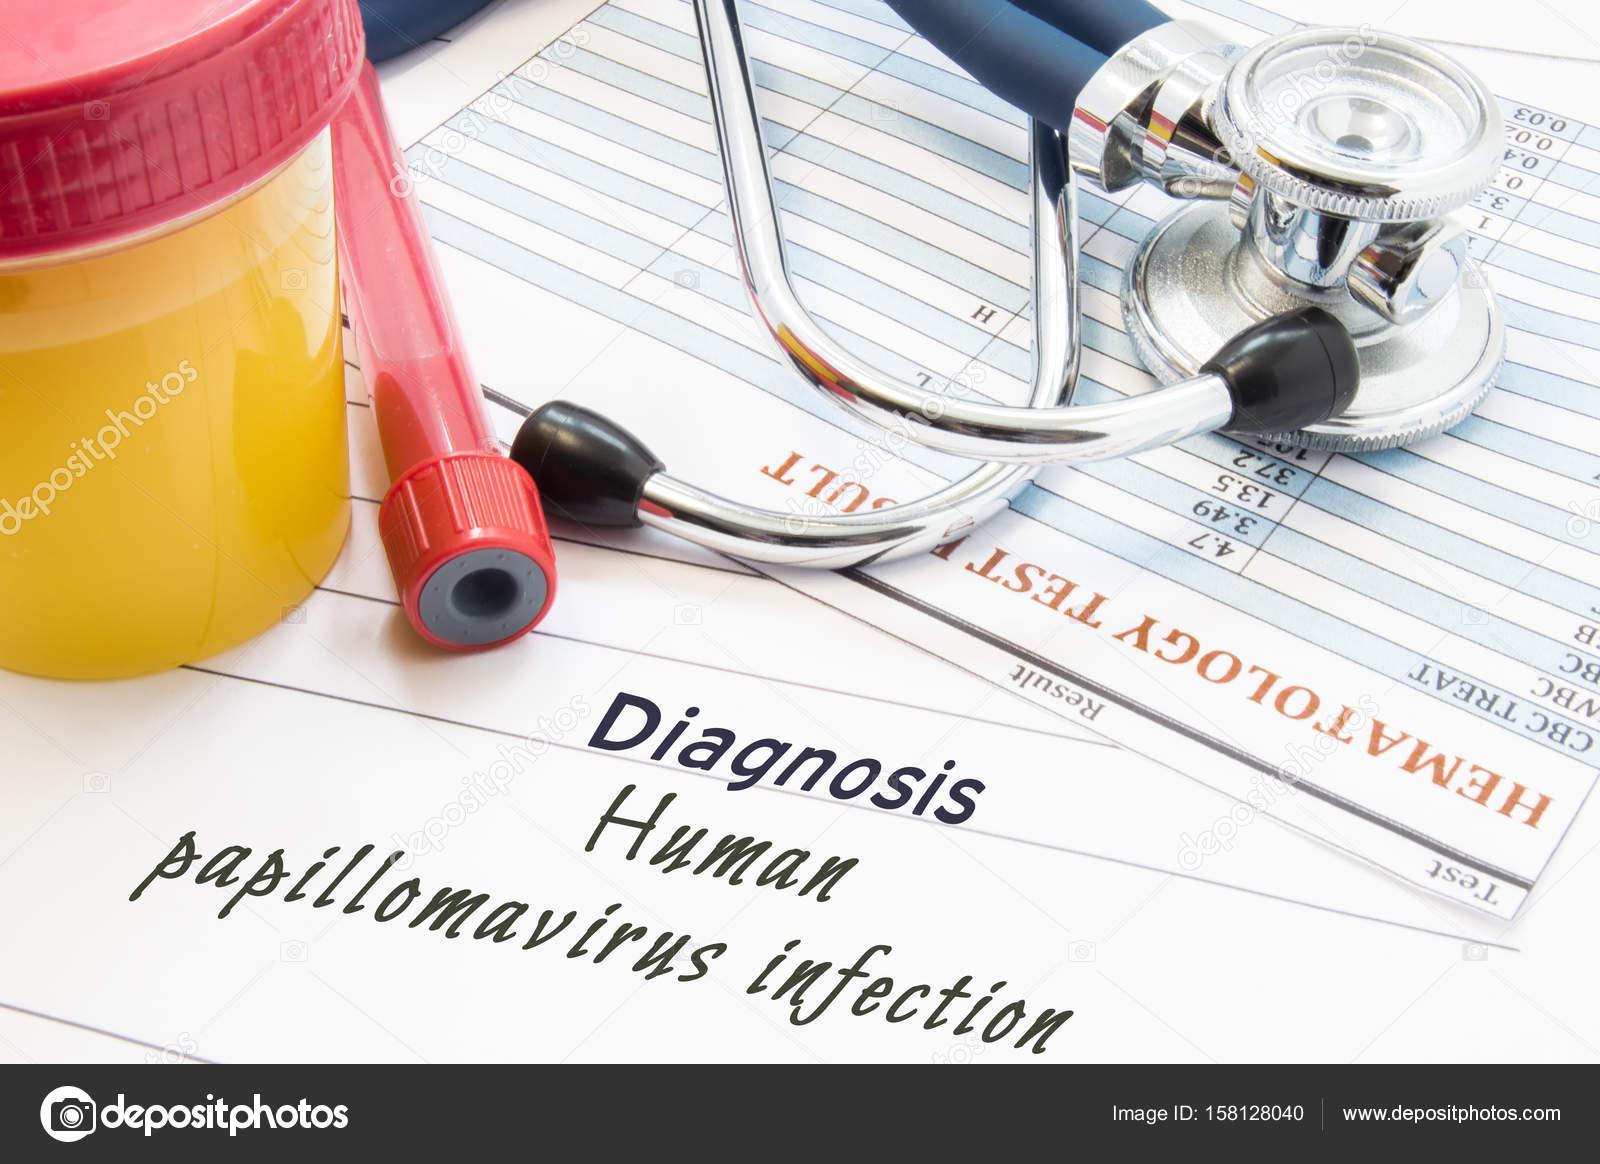 human papillomavirus infection diagnosed